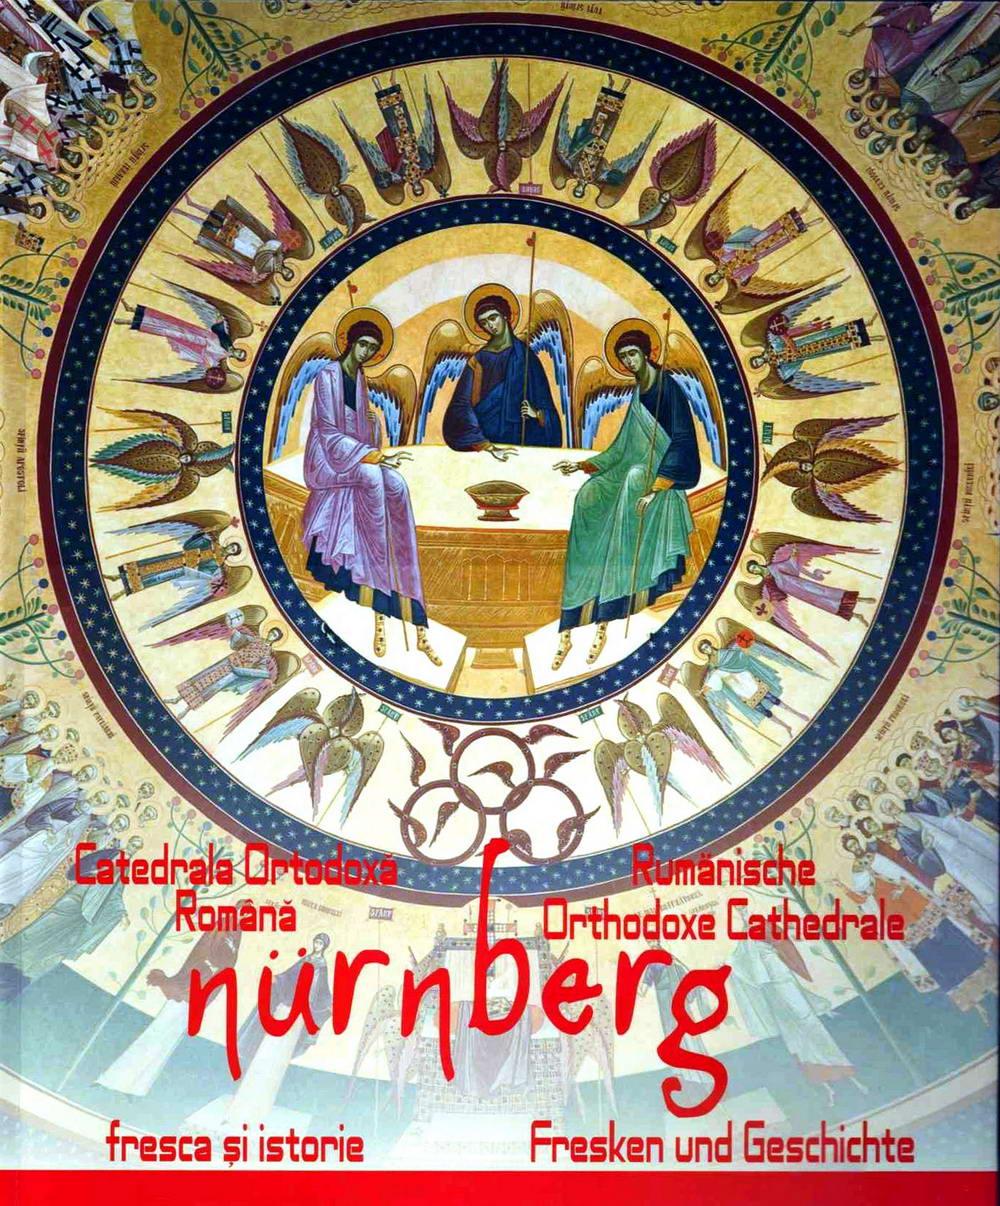 Catedrala Ortodoxa din Nurnberg, fresca si istorie - Grigore Popescu